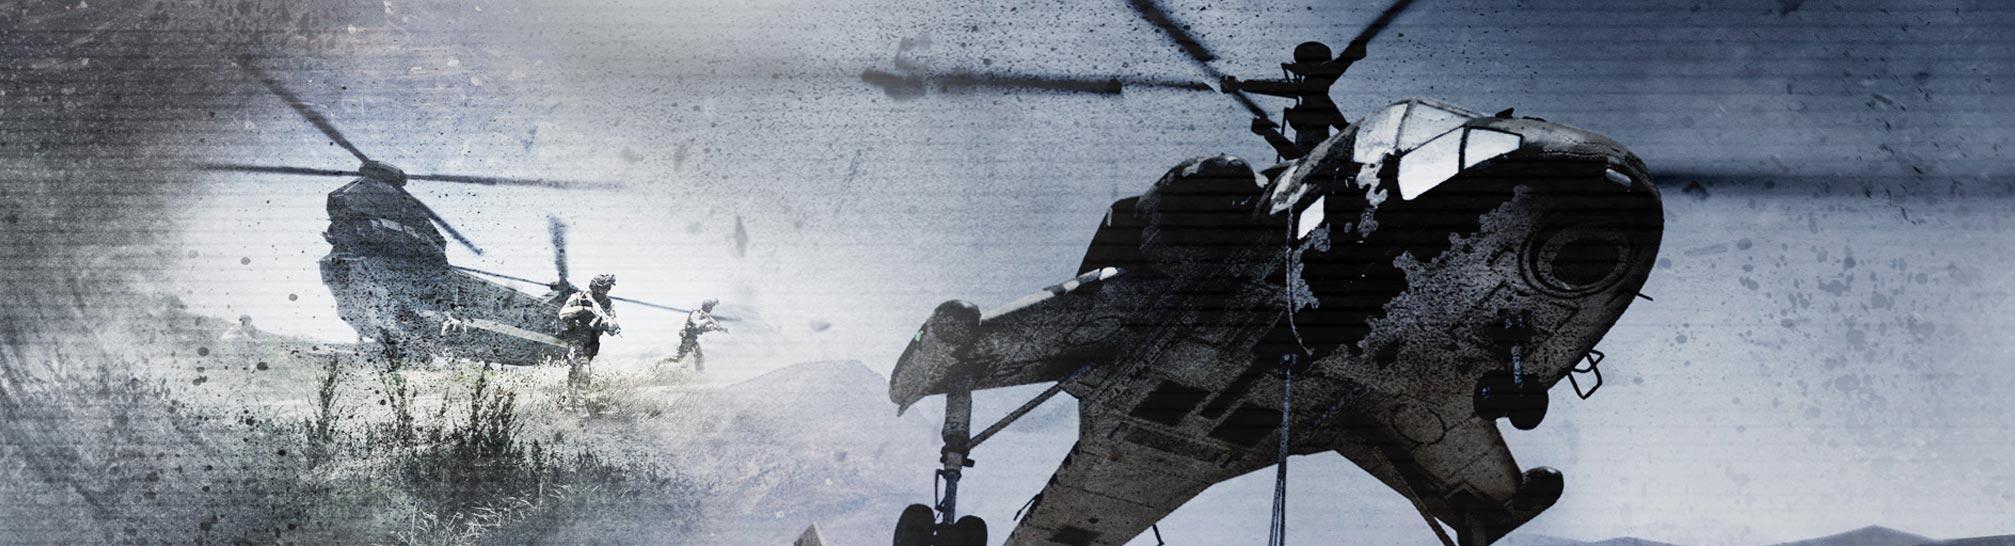 Arma 3 Helicopters | Bohemia Interactive